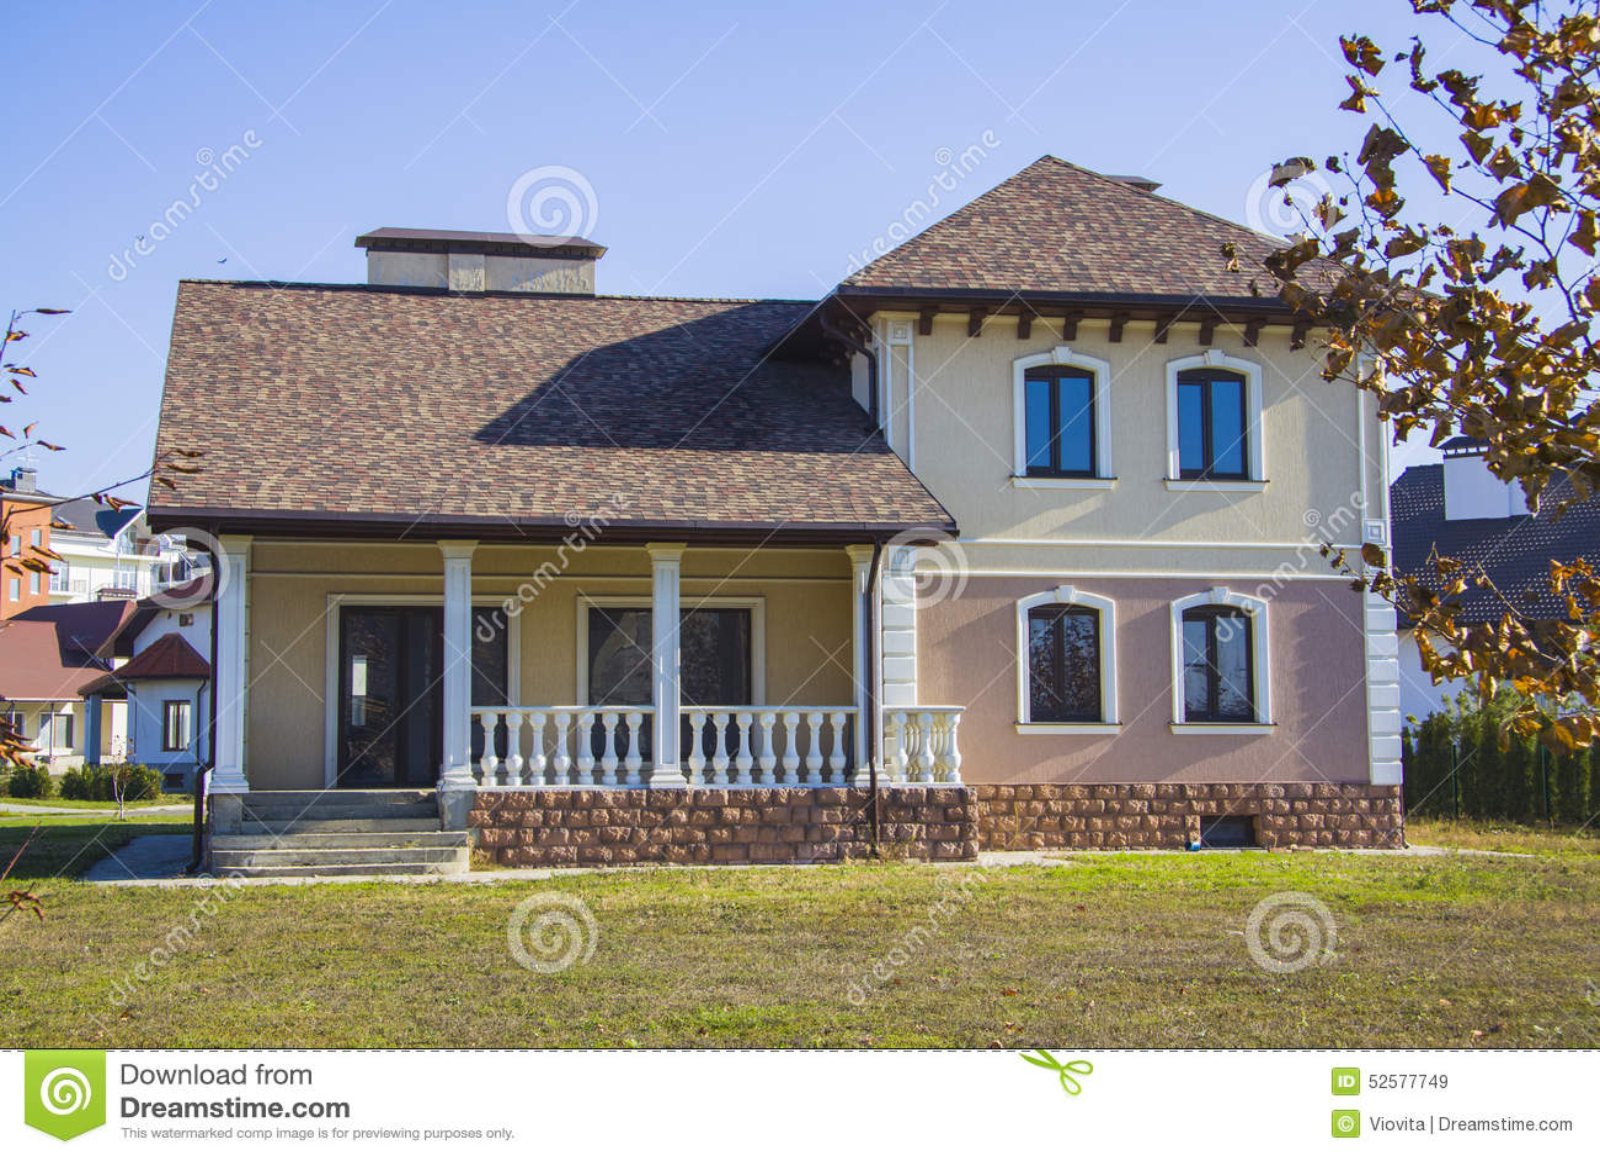 belle maison image stock image du patrimoine fa ade. Black Bedroom Furniture Sets. Home Design Ideas